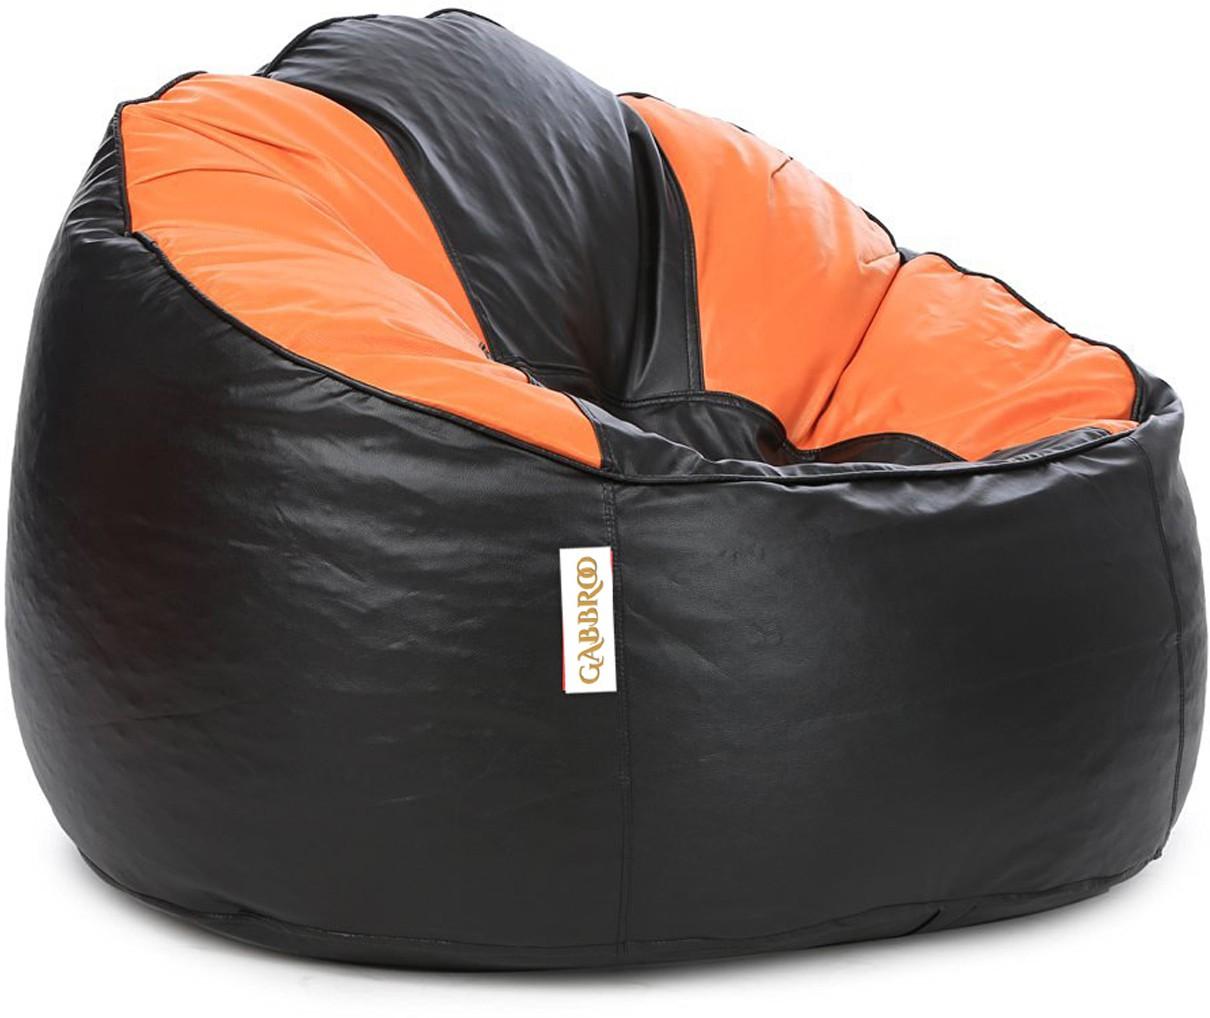 View Gabbroo XXXL Lounger Bean Bag Cover(Orange, Black) Furniture